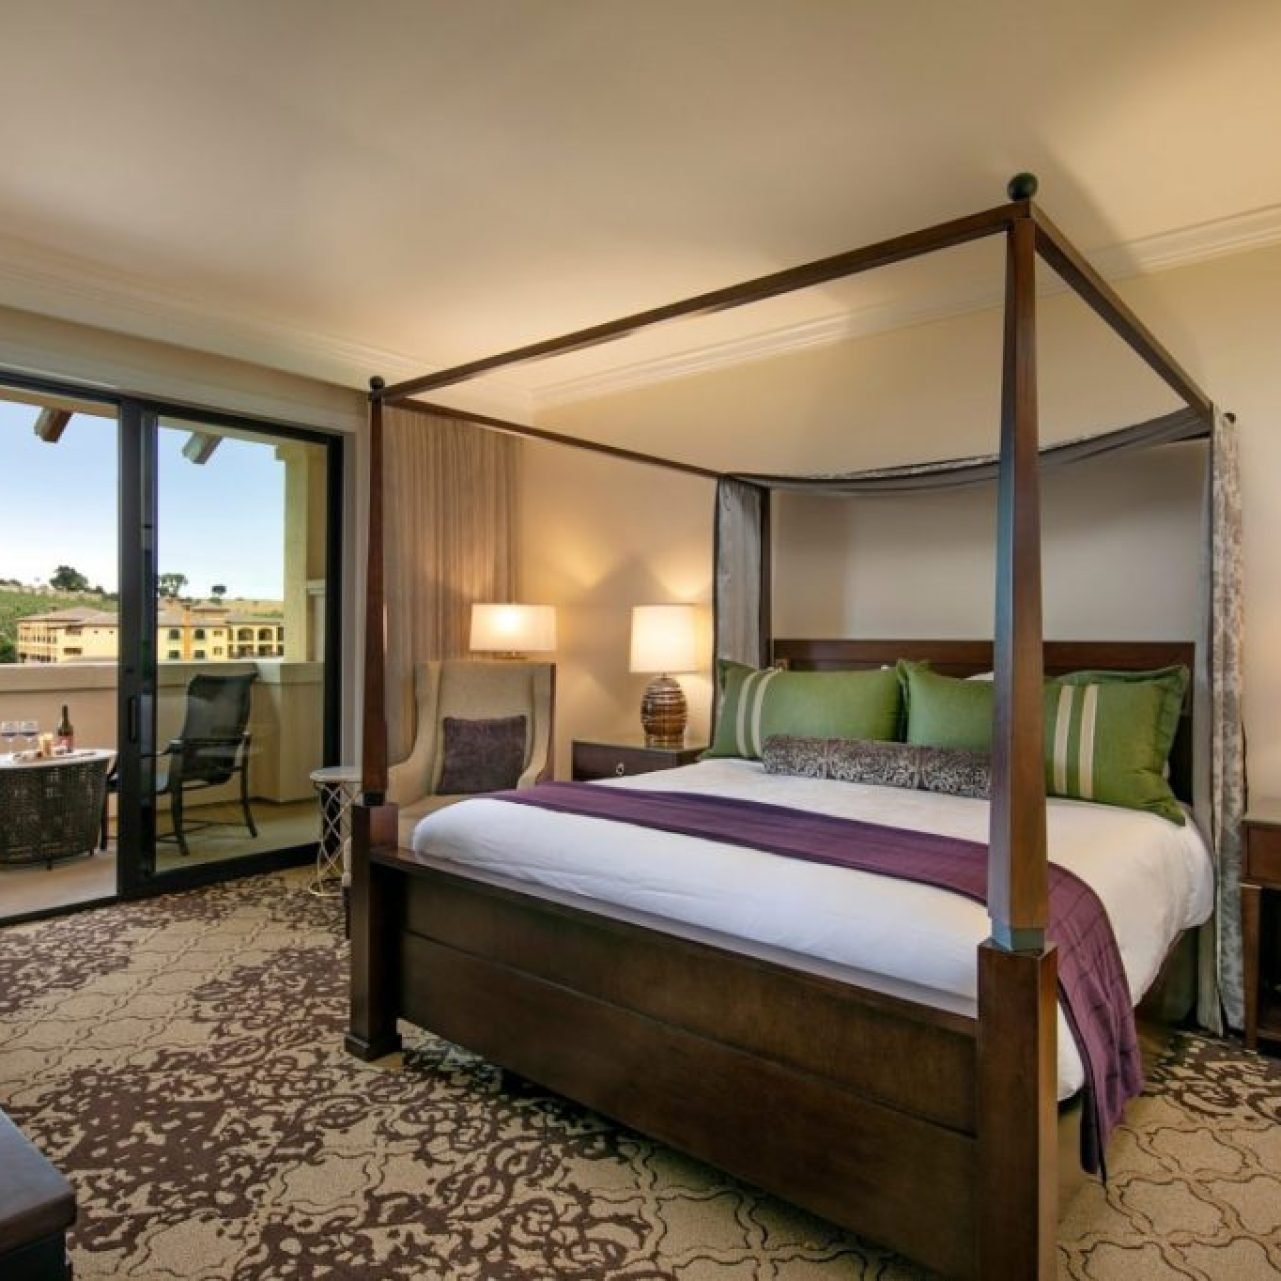 The Rooms at Vista Collina